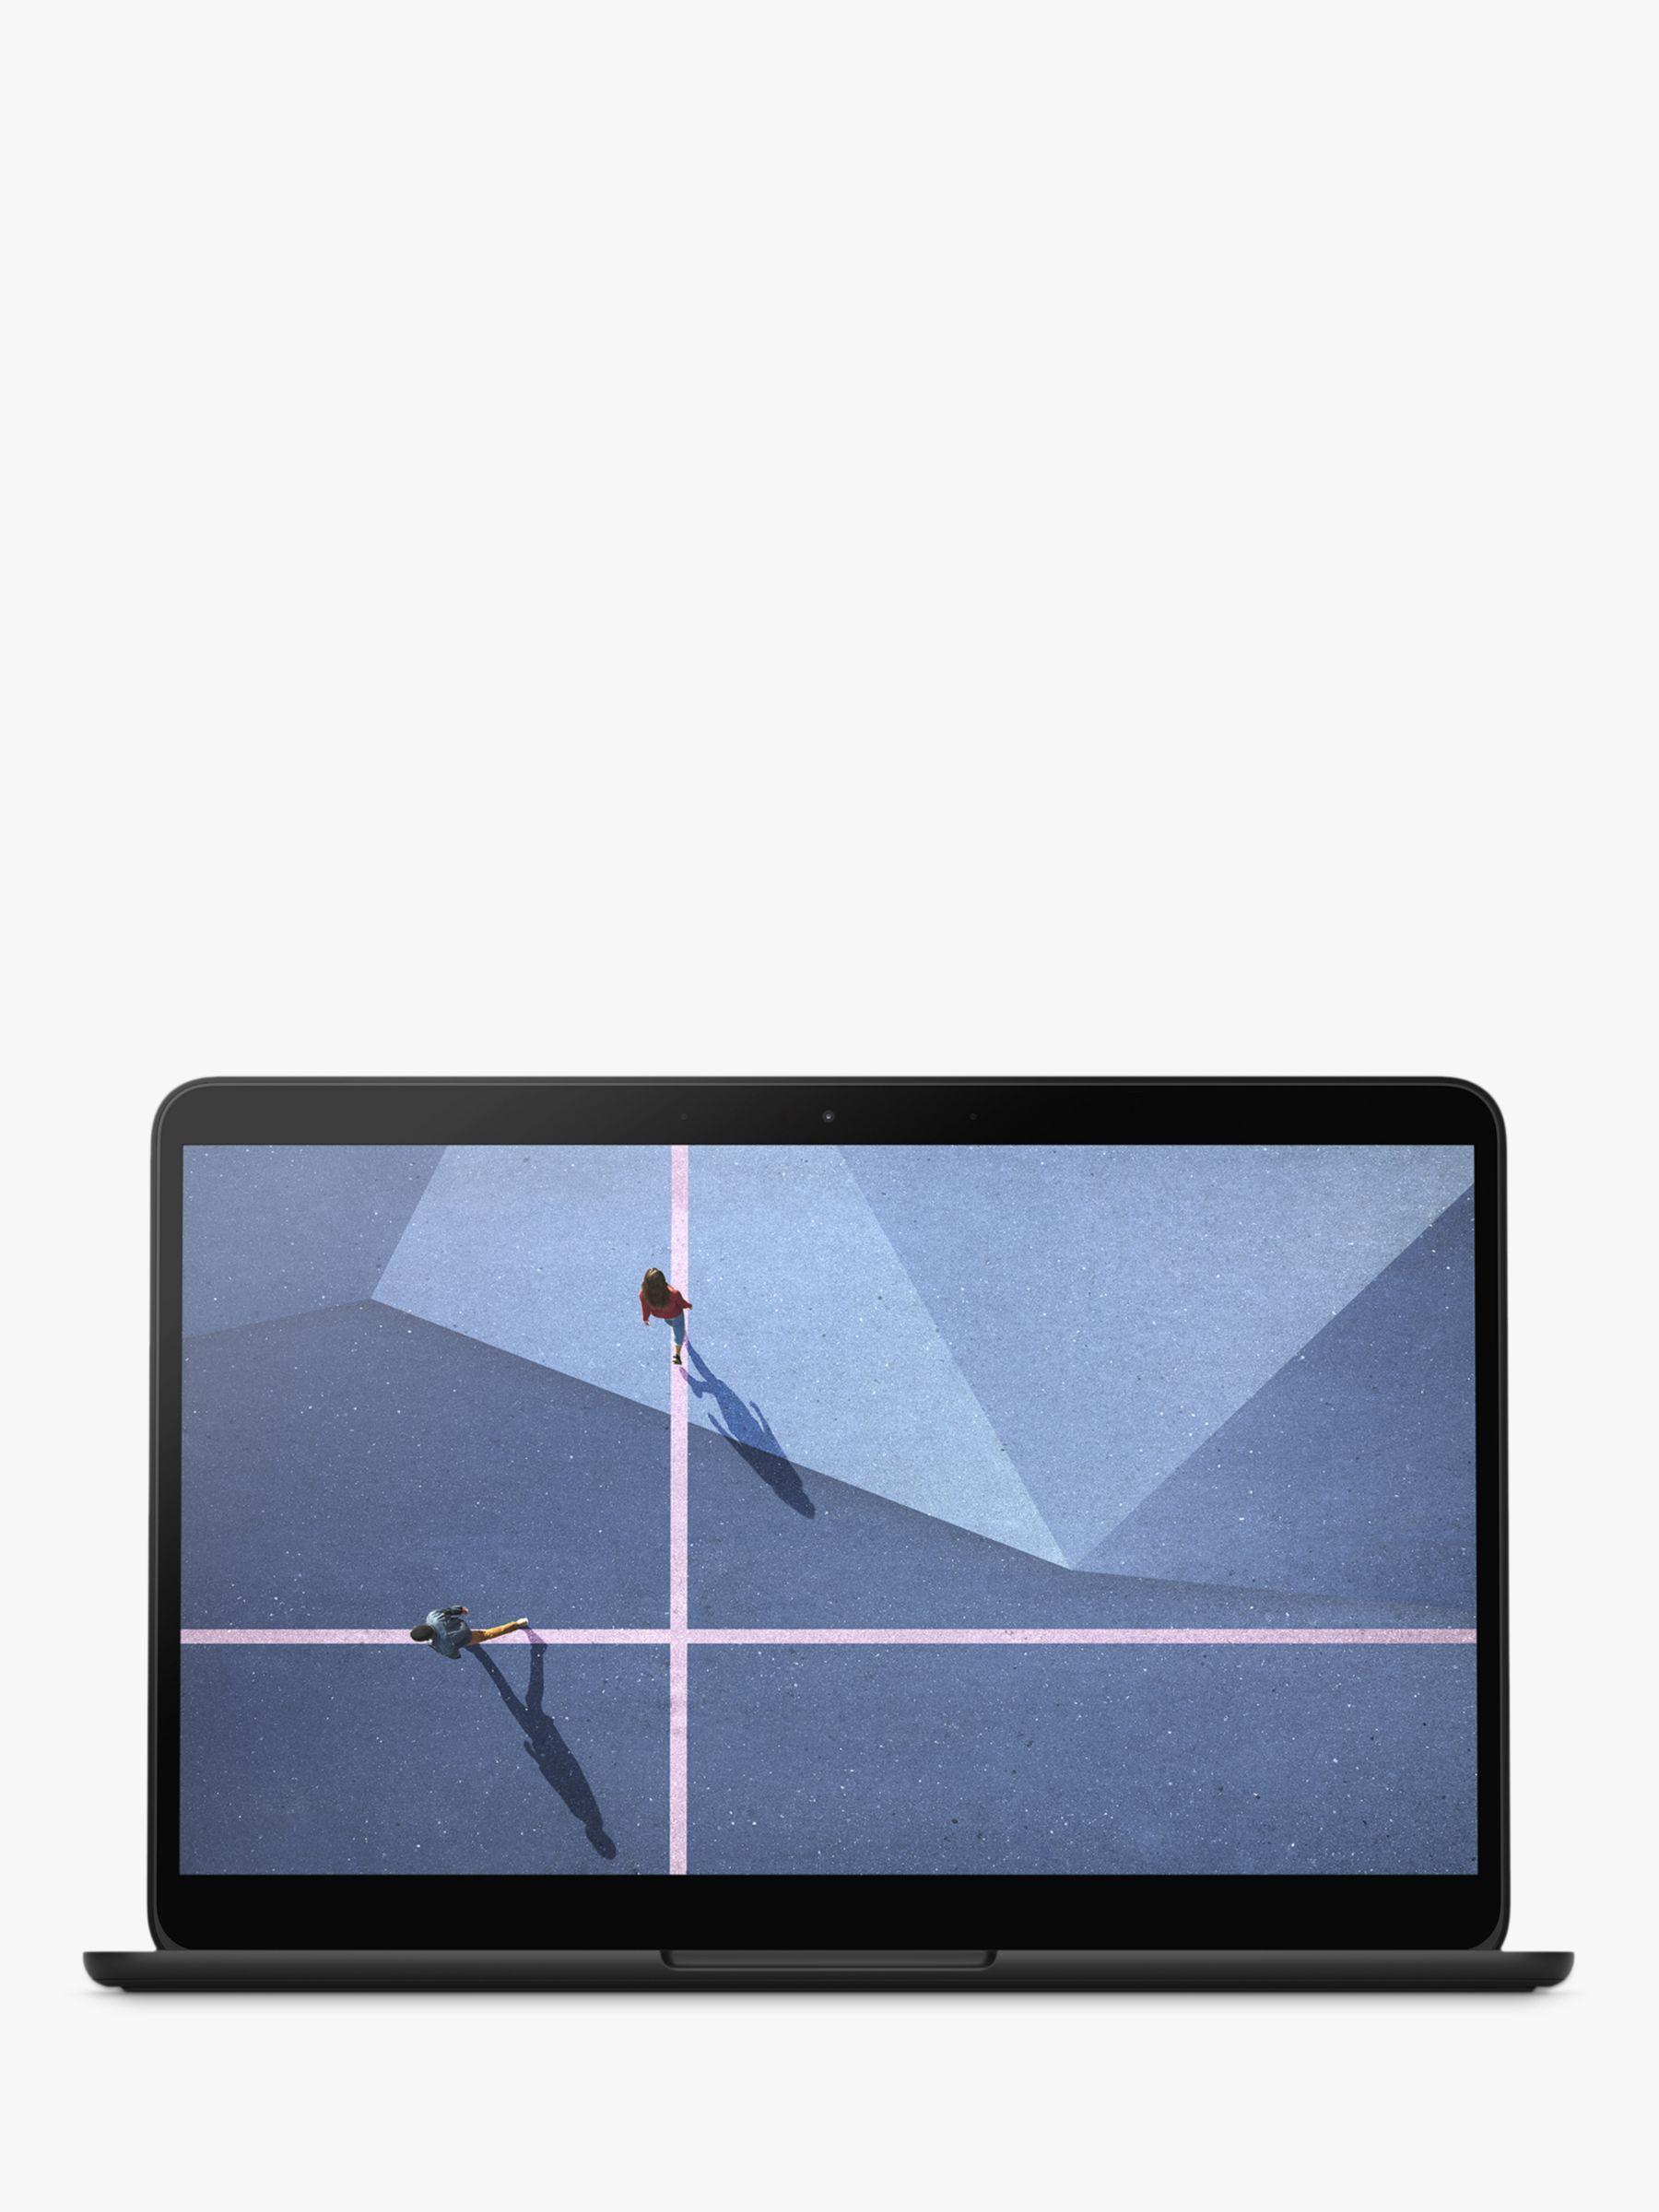 Google Pixelbook Go GA00526-UK Laptop, Intel Core M3 Processor, 8GB RAM, 64GB, 13.3